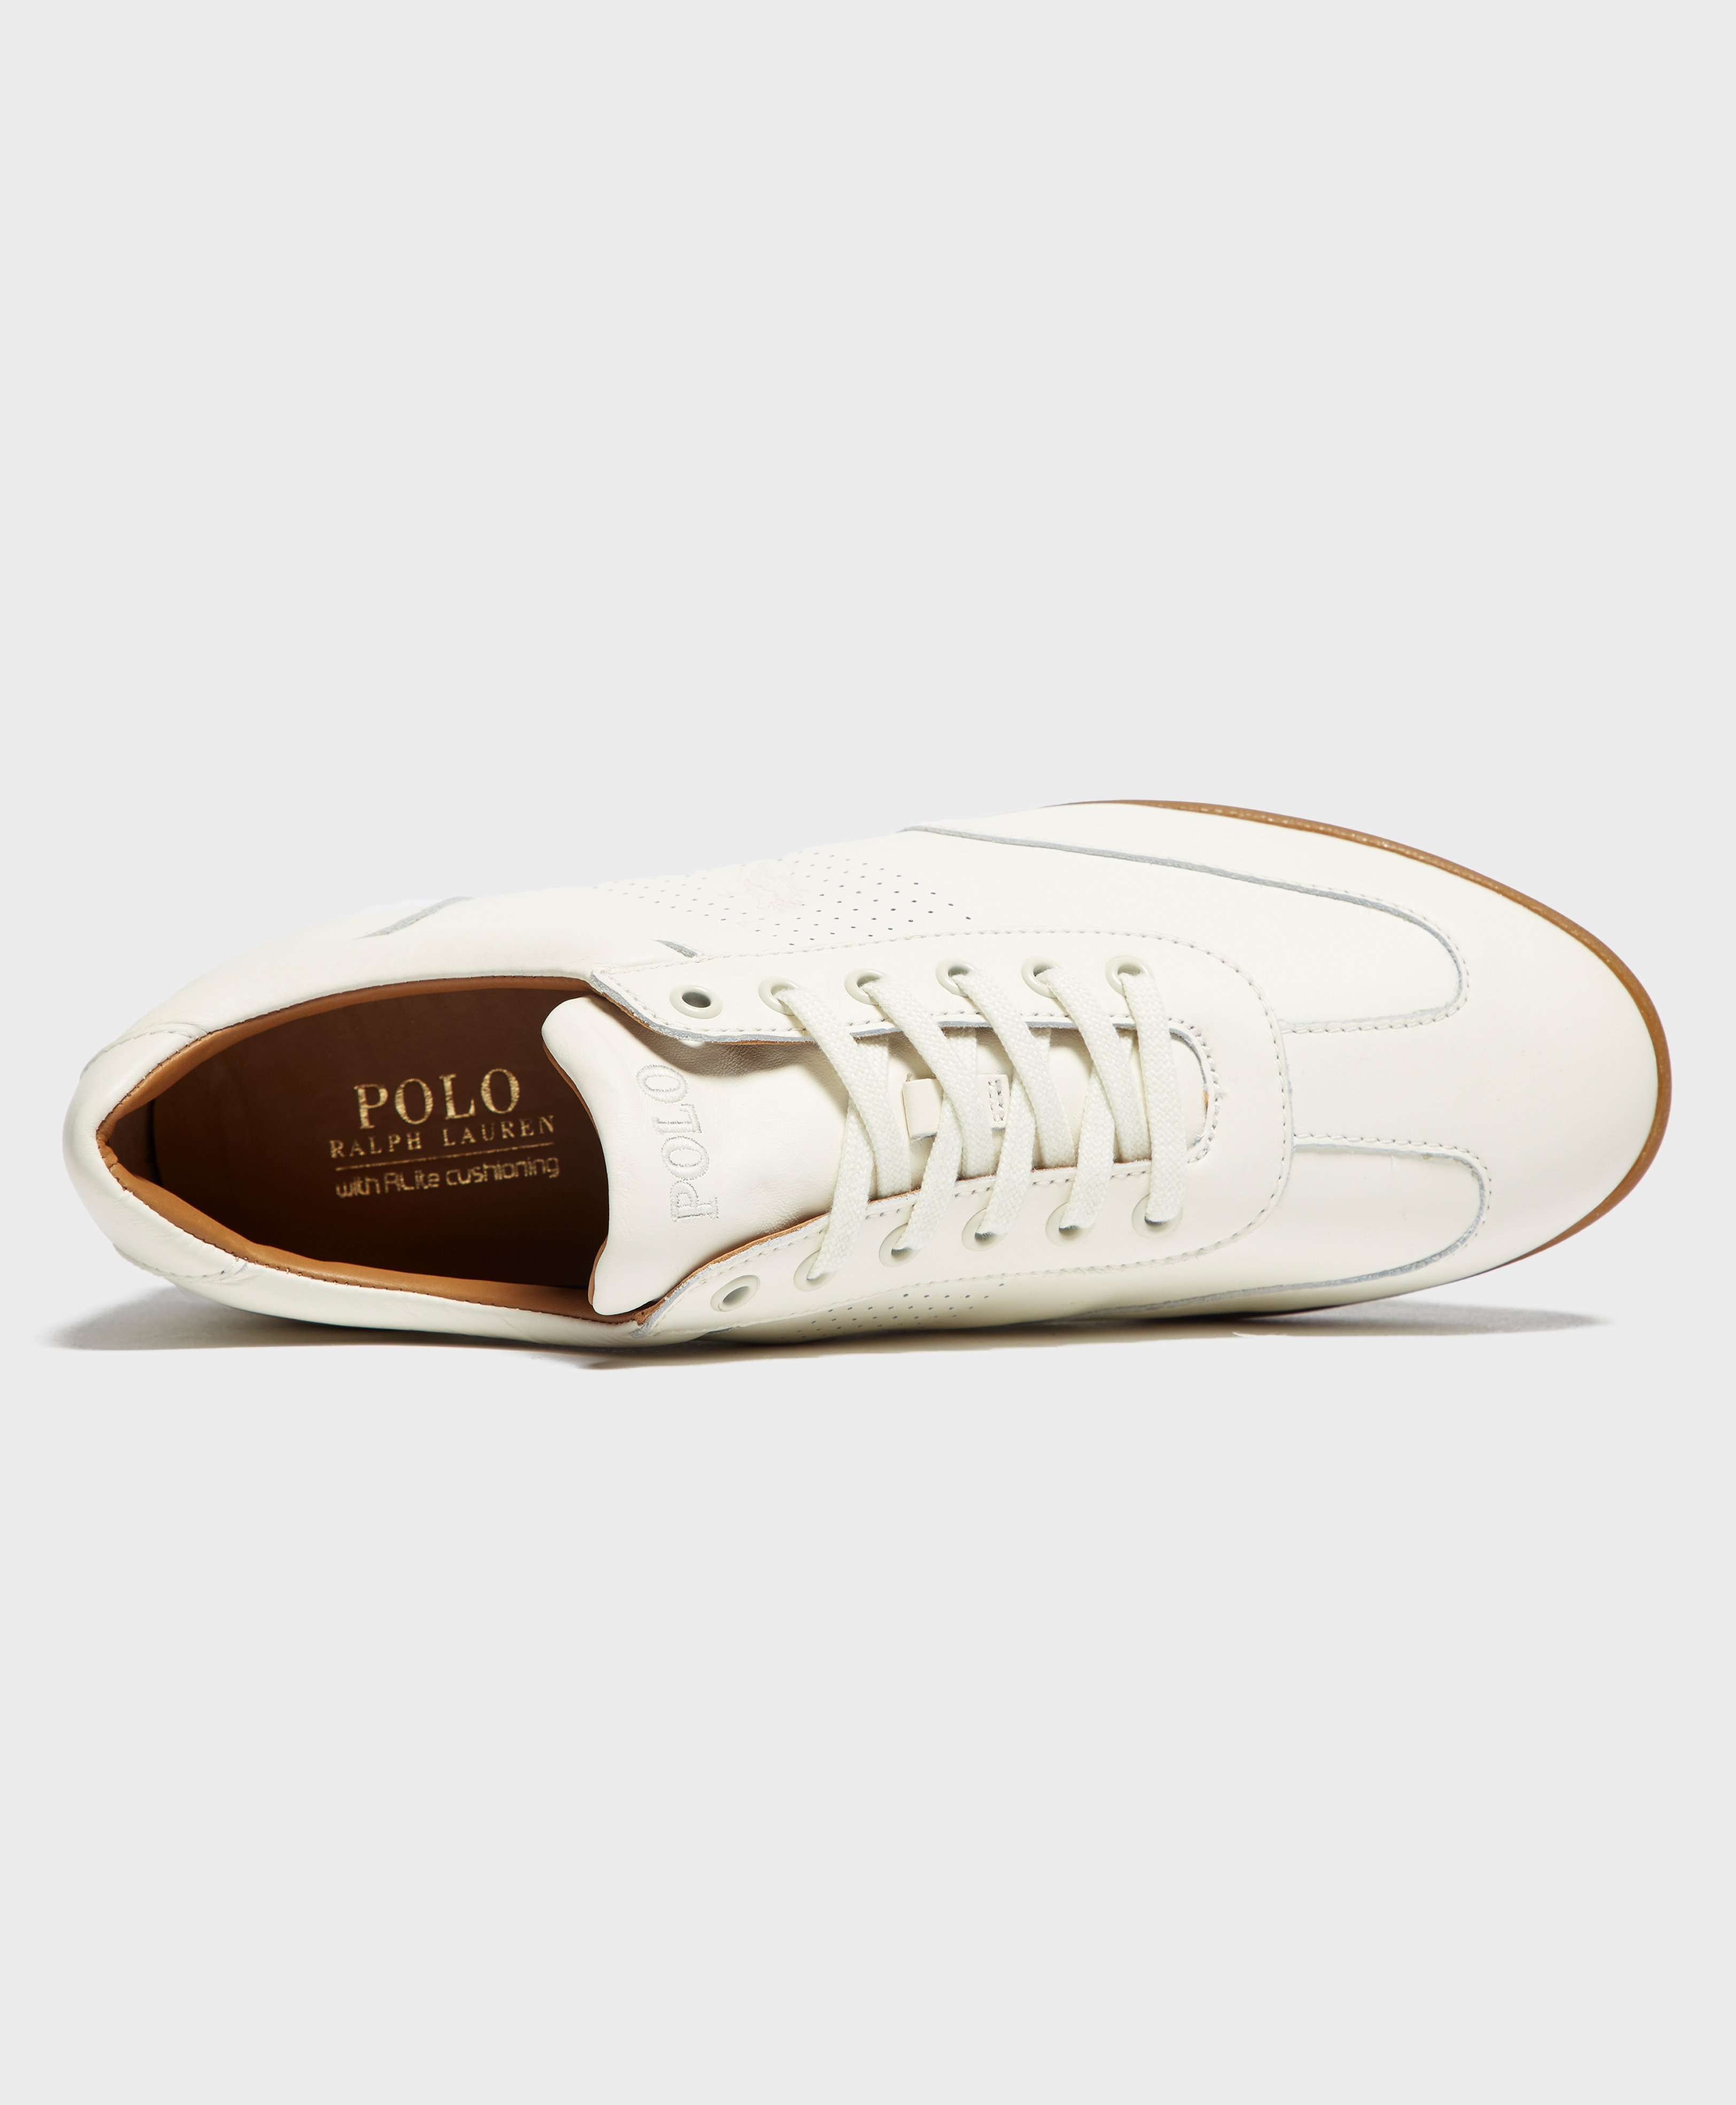 Polo Ralph Lauren Cadoc Leather